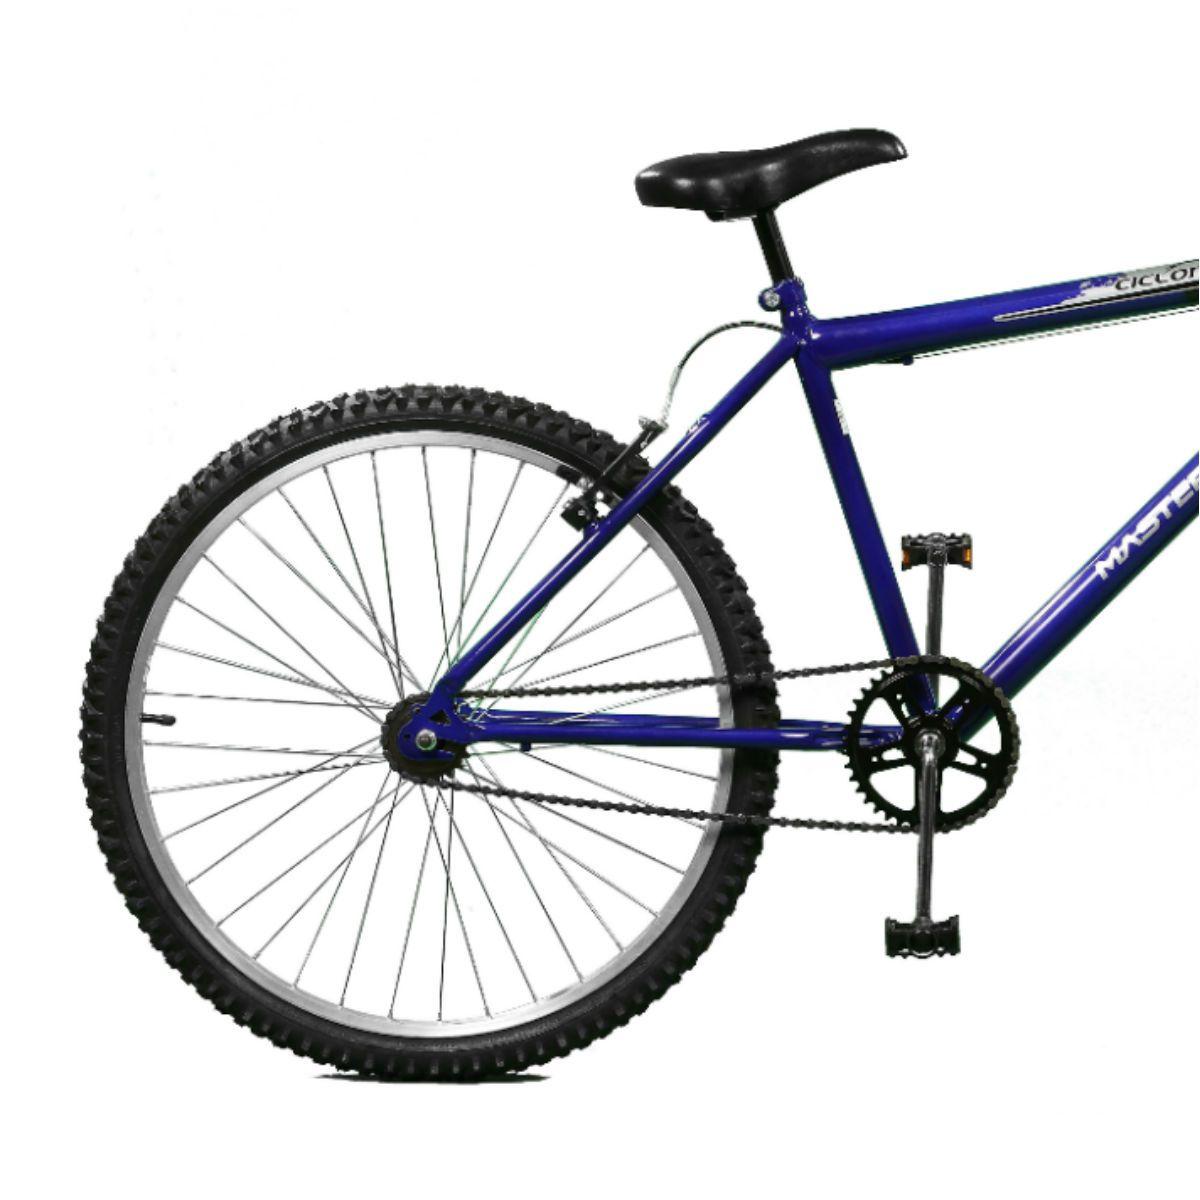 Bicicleta Master Bike Aro 26 Ciclone Freio V-Brake Azul/Preto